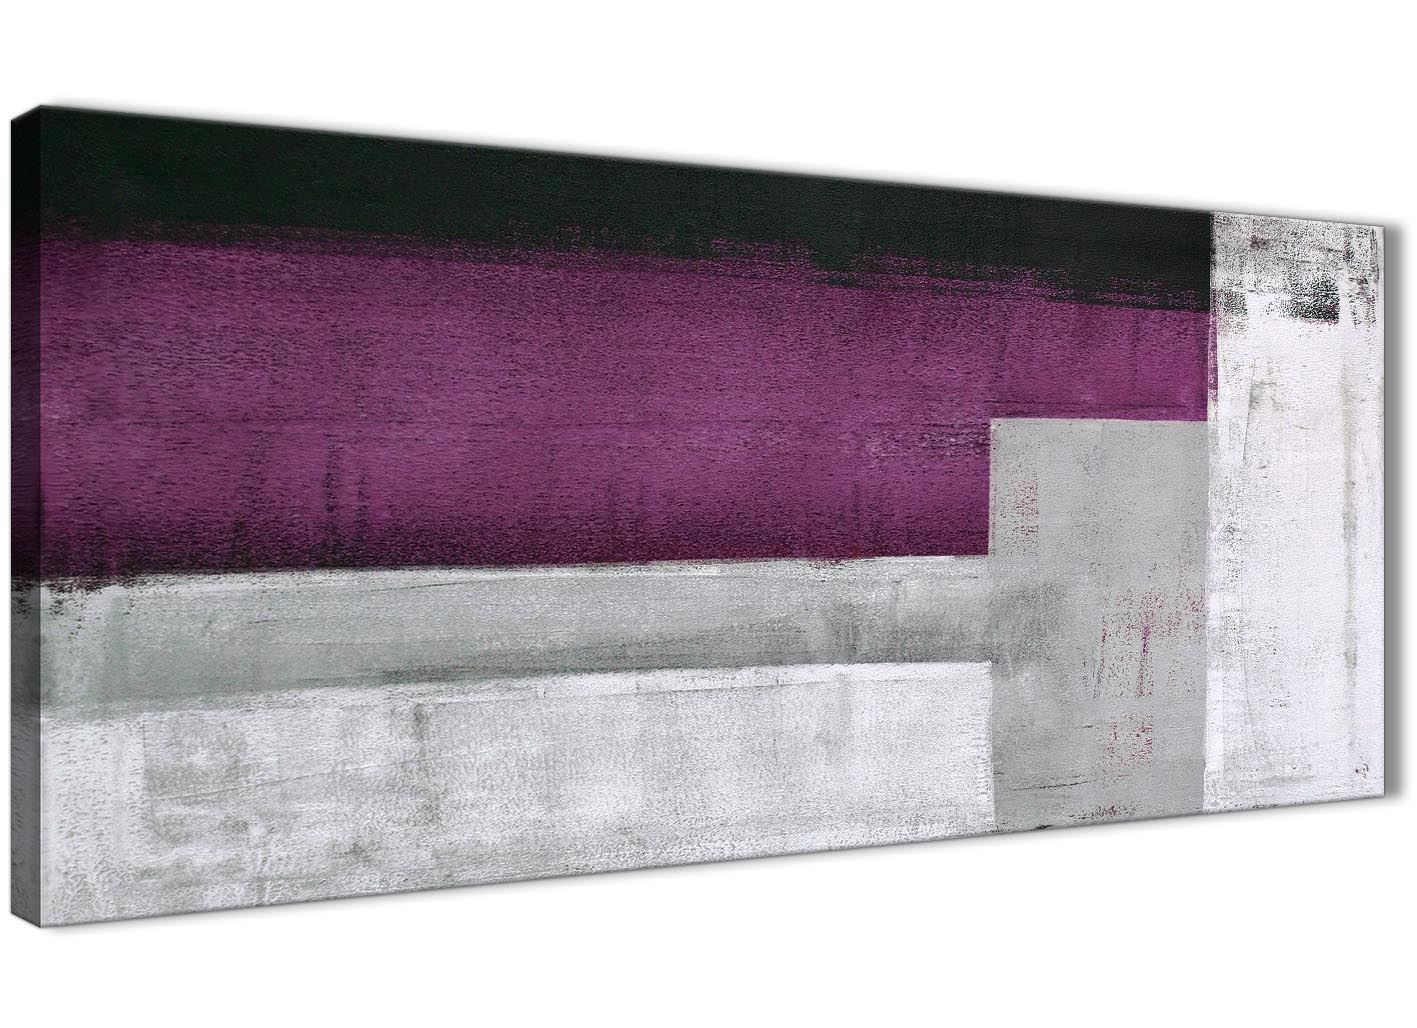 Lila Grau Wandbild Ölgemälde Wohnzimmer Leinwand Kunstdruck Zubehör–Abstrakt 1427–120cm Print Wallfillers